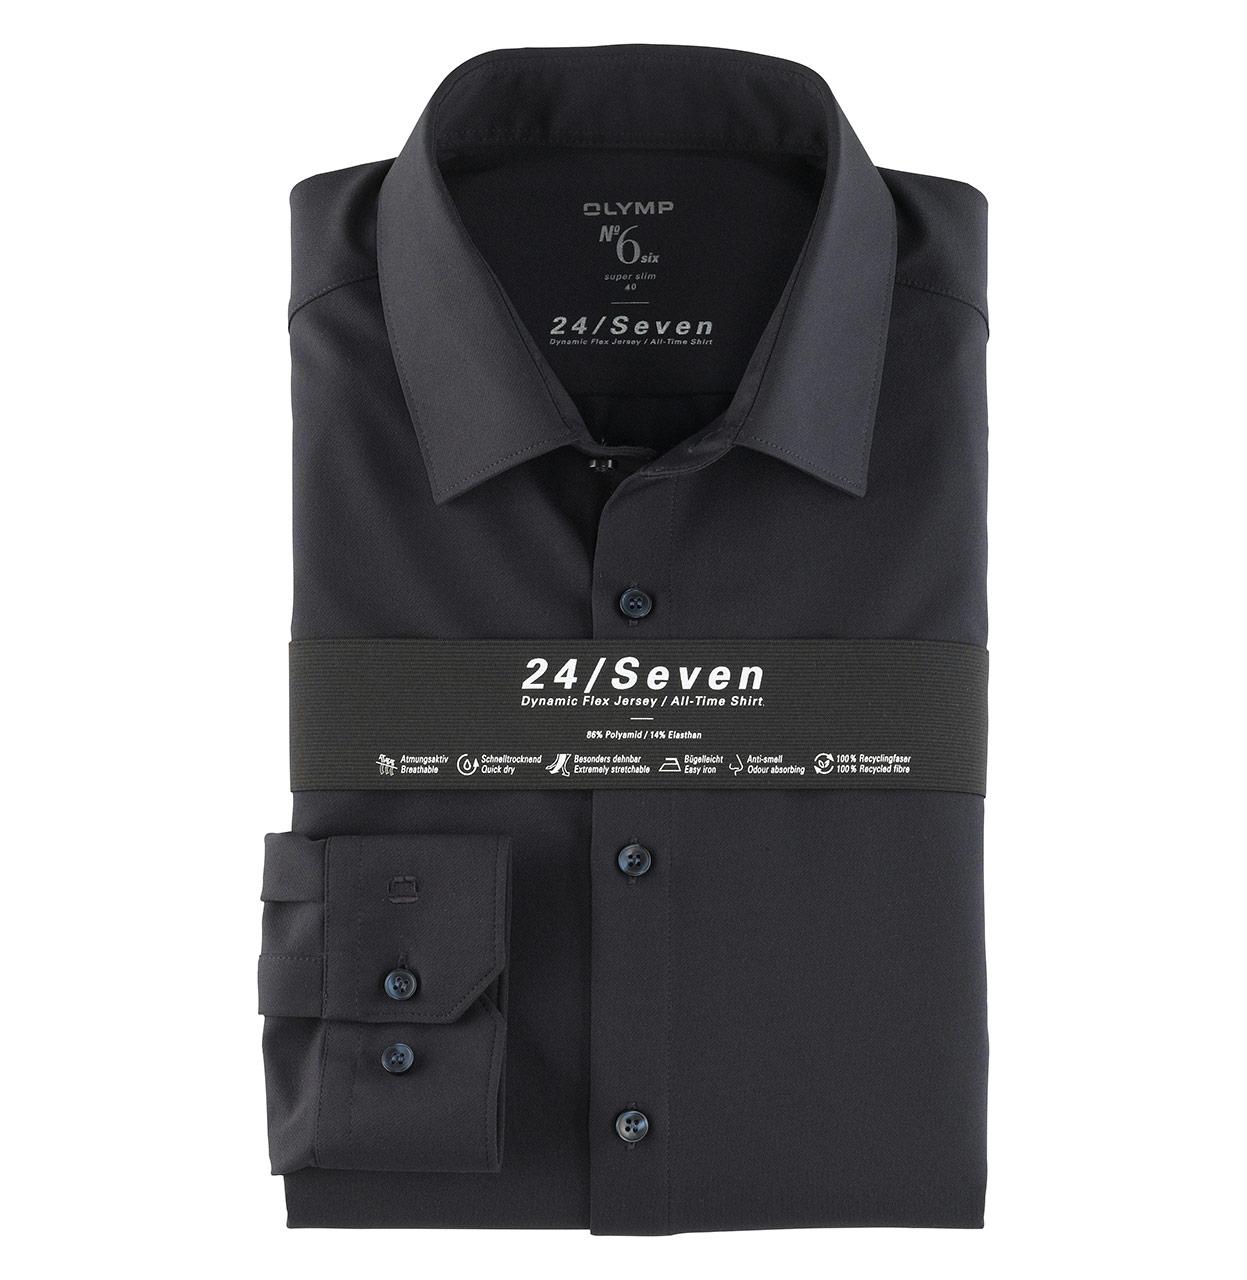 OLYMP Shirt 251264 18 1 251264 marine Maat 37